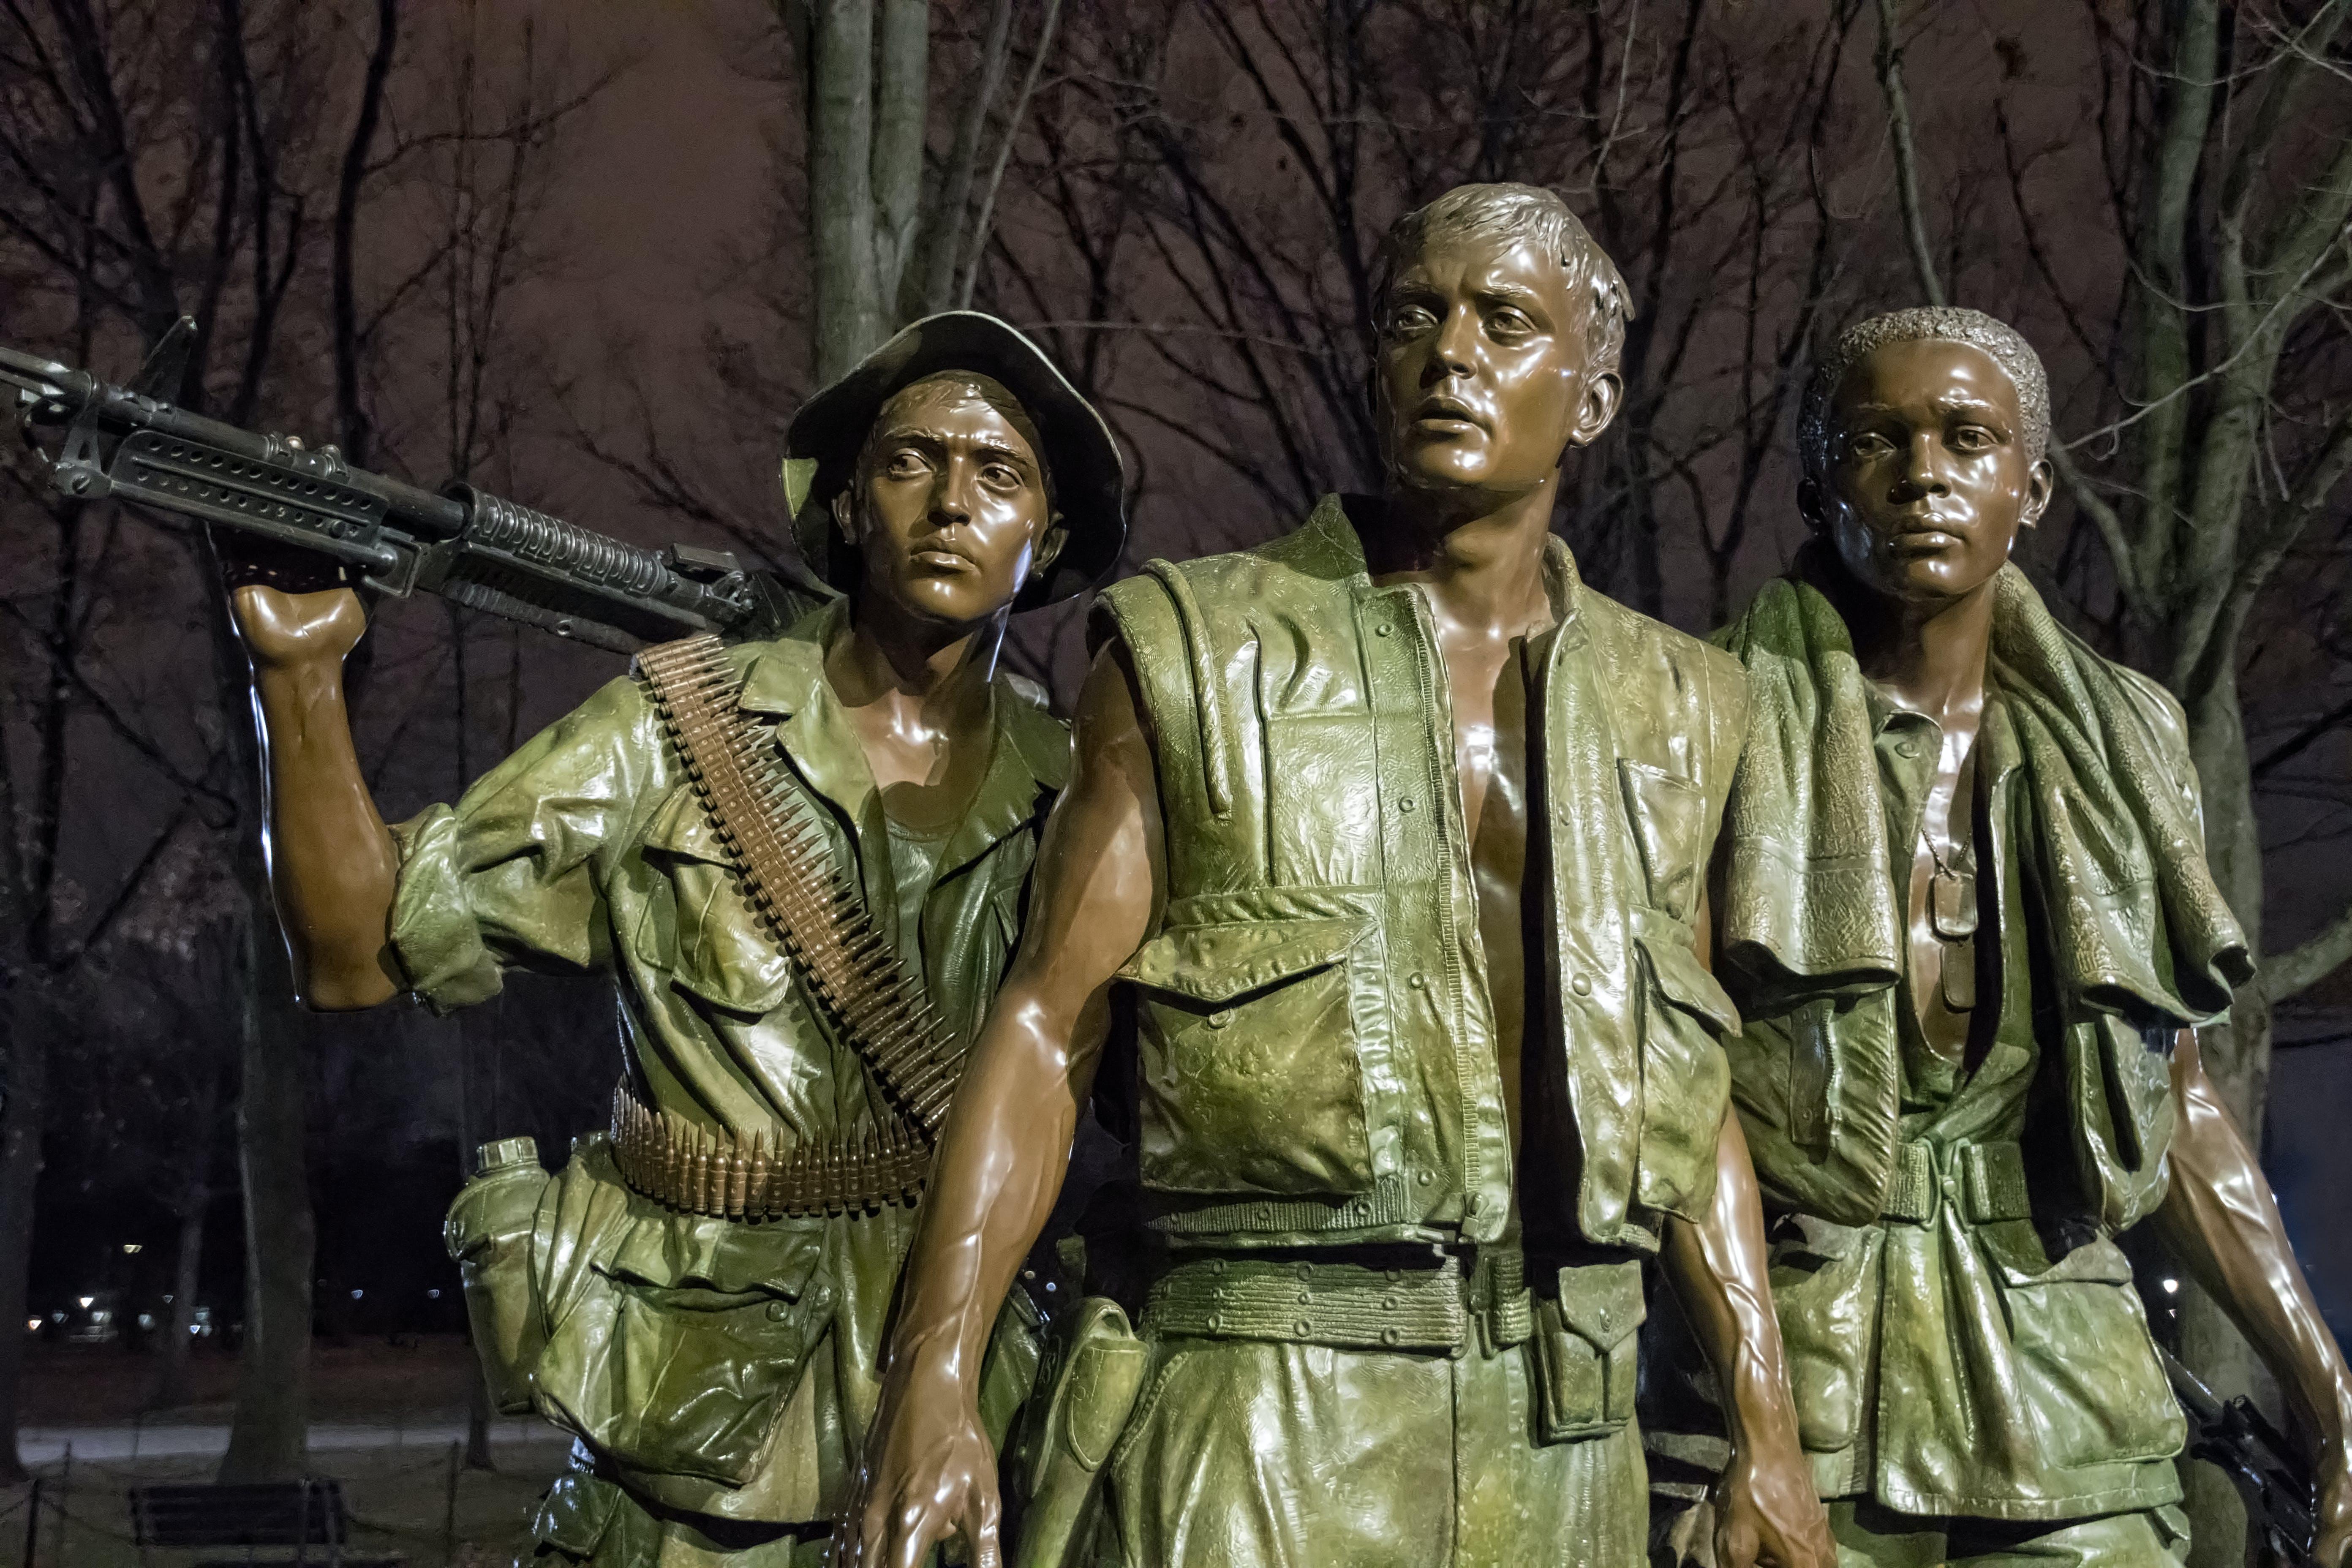 Free stock photo of The Three Service Men, vietnam veterans memorial